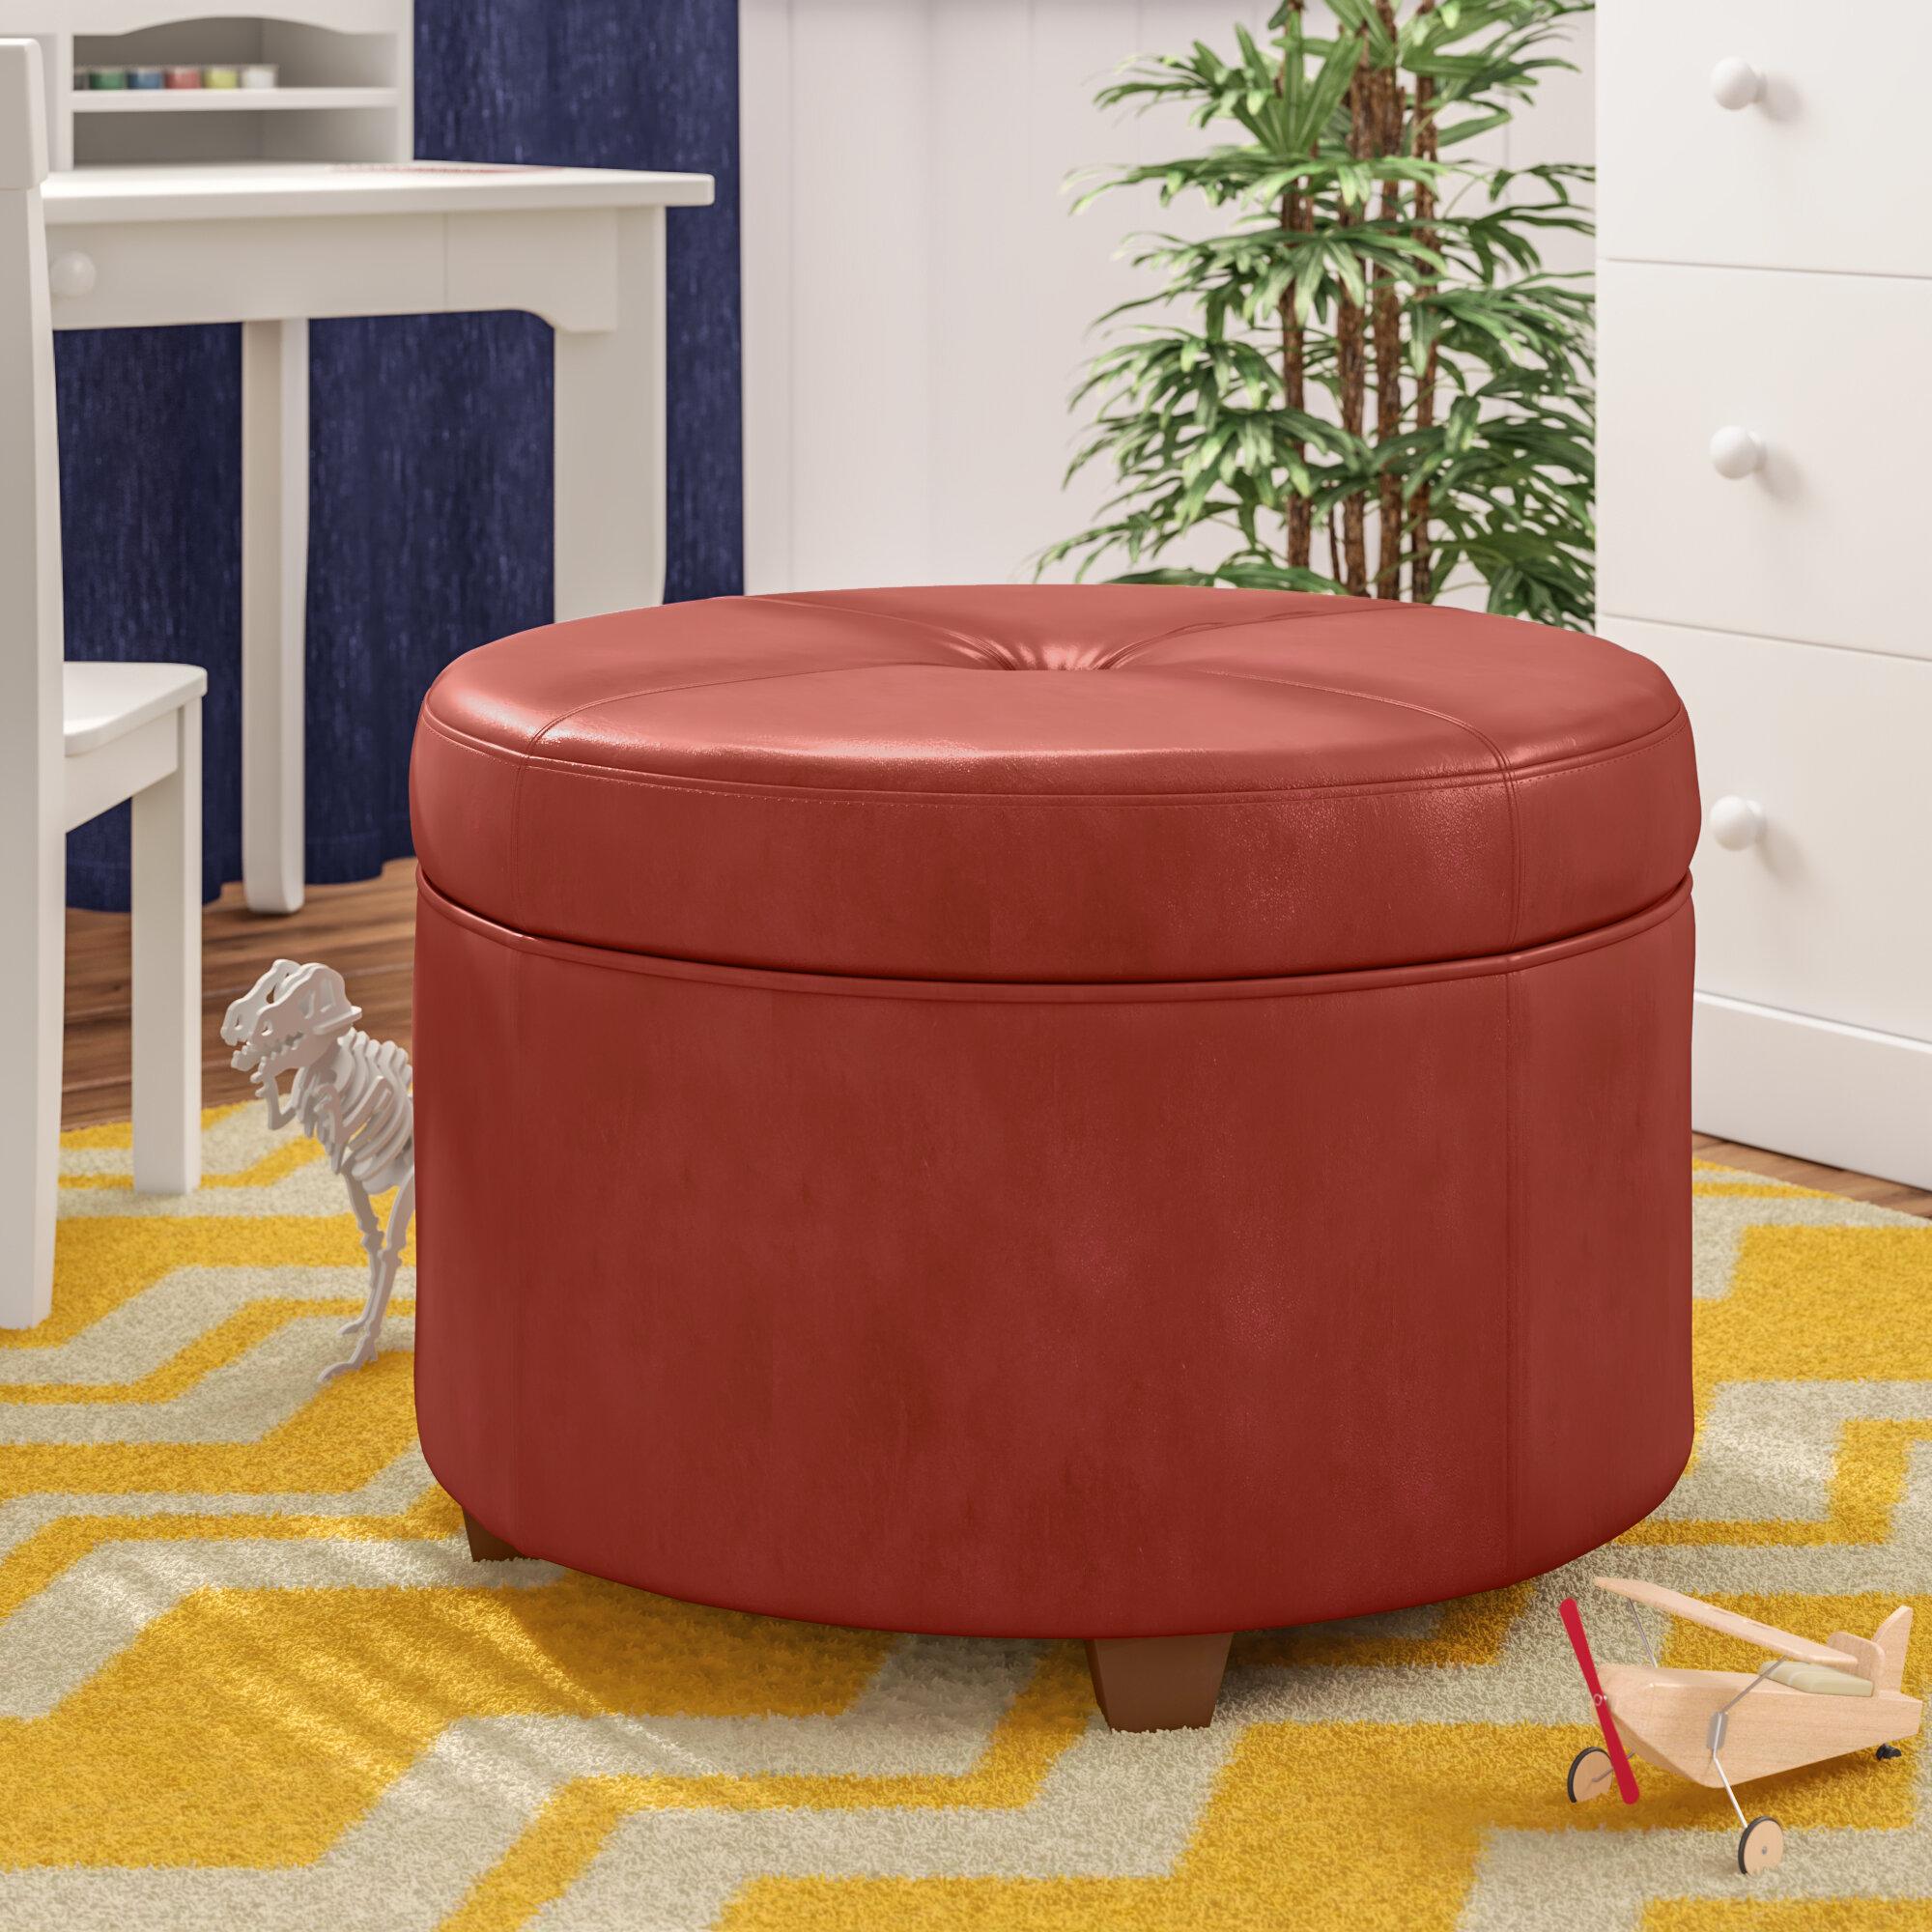 Amazing Viv Rae Salvatore Tufted Storage Ottoman Reviews Wayfair Andrewgaddart Wooden Chair Designs For Living Room Andrewgaddartcom